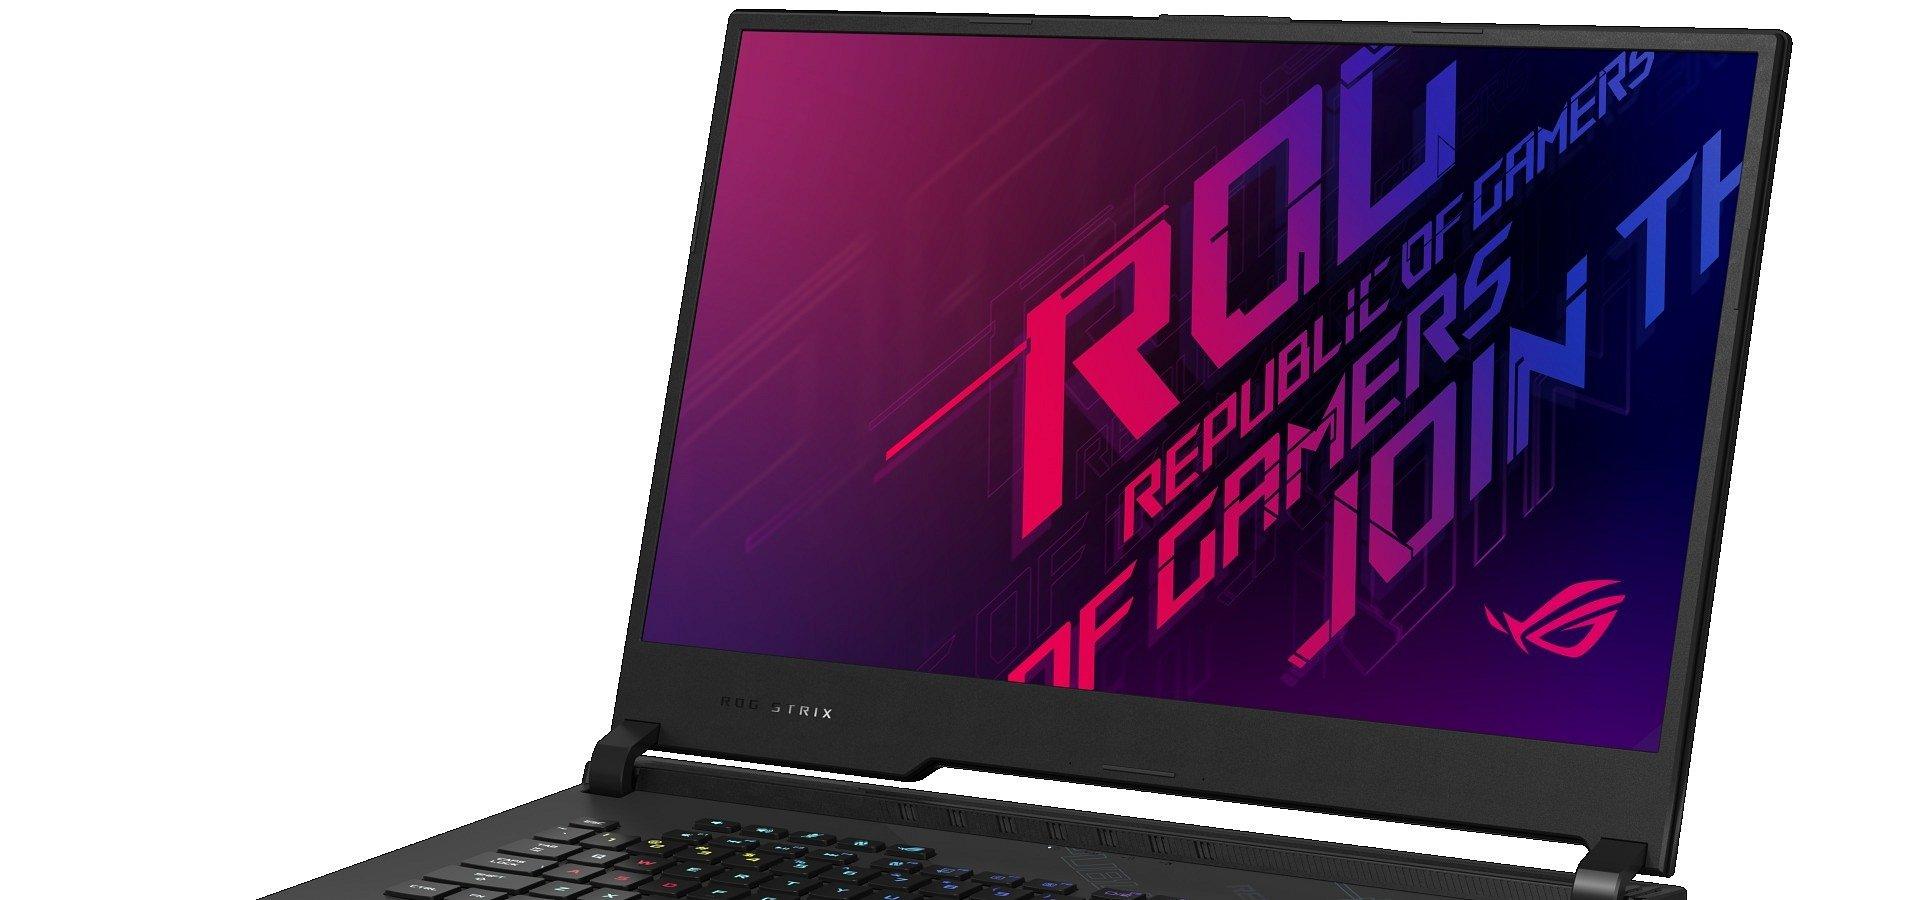 ASUS Republic of Gamers prezentuje laptopa gamingowego klasy premium - Strix SCAR 17